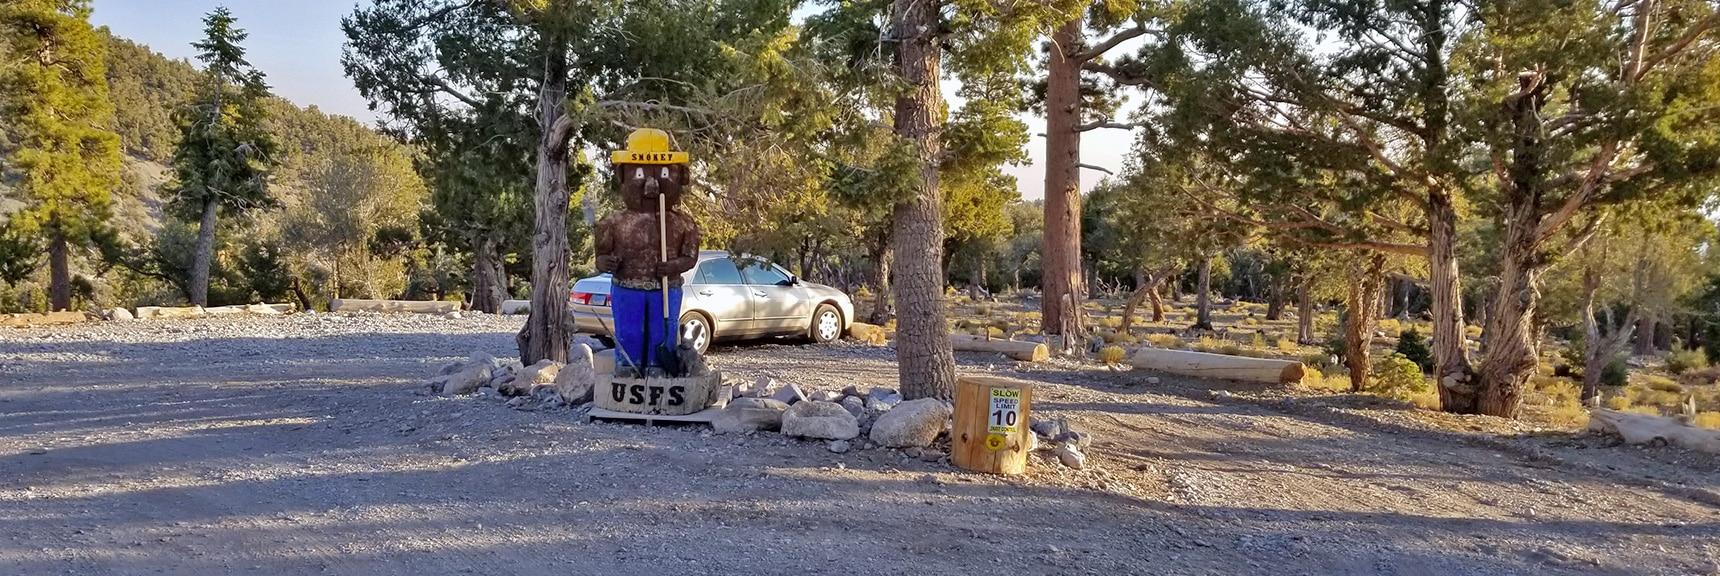 USFS Smokey the Bear Statue on Road   Mummy Mountain's Head, Mt Charleston Wilderness, Spring Mountains, Nevada 005